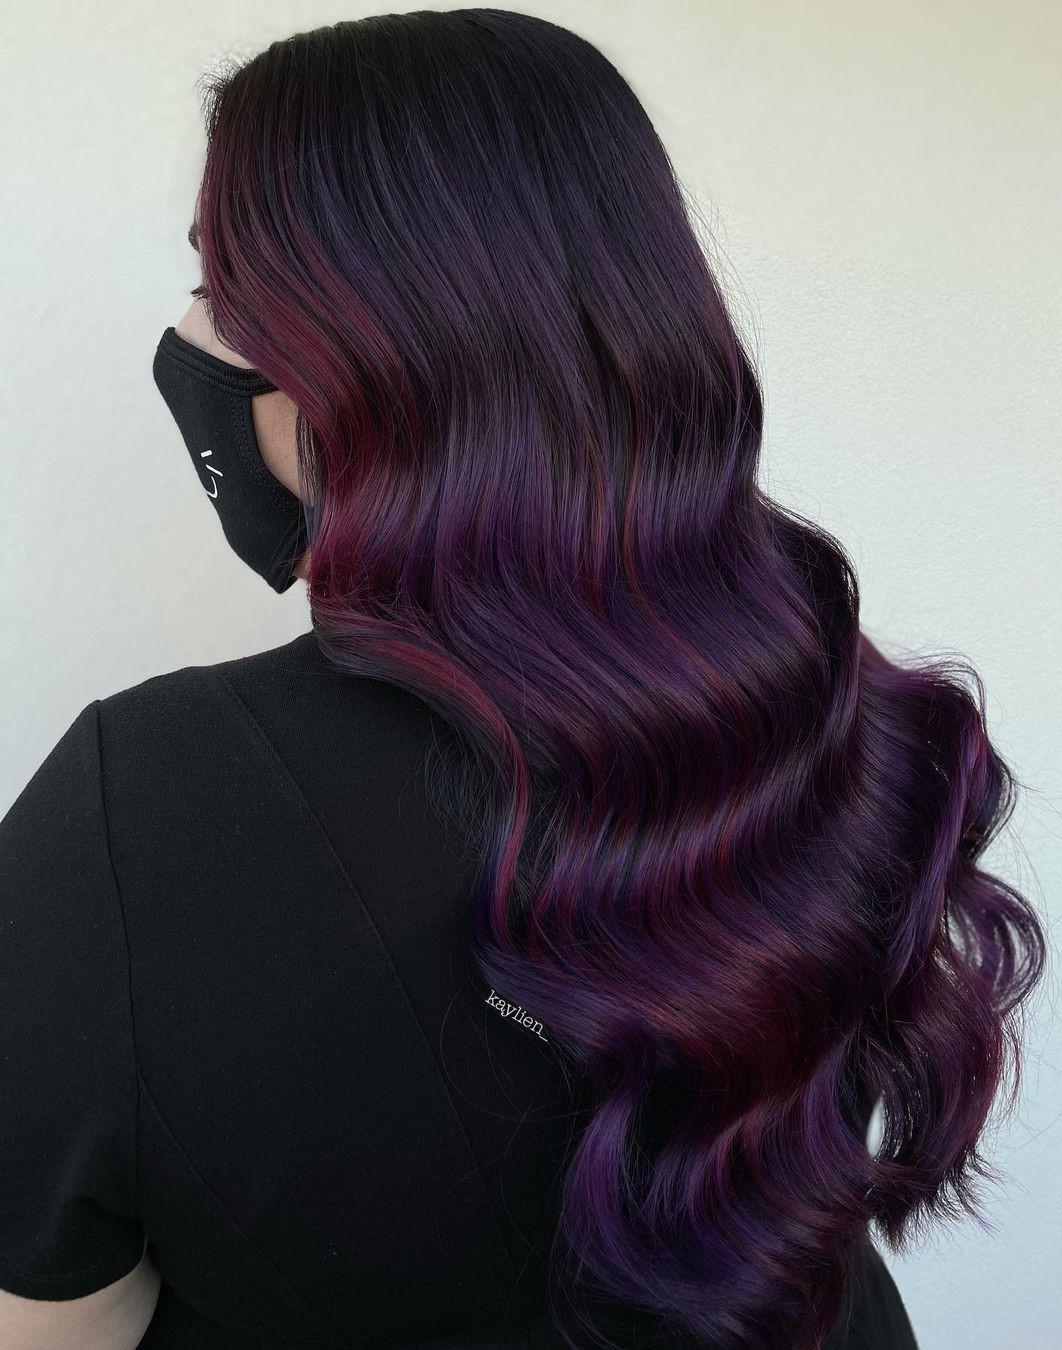 Plum Hair Color with Burgundy Highlights